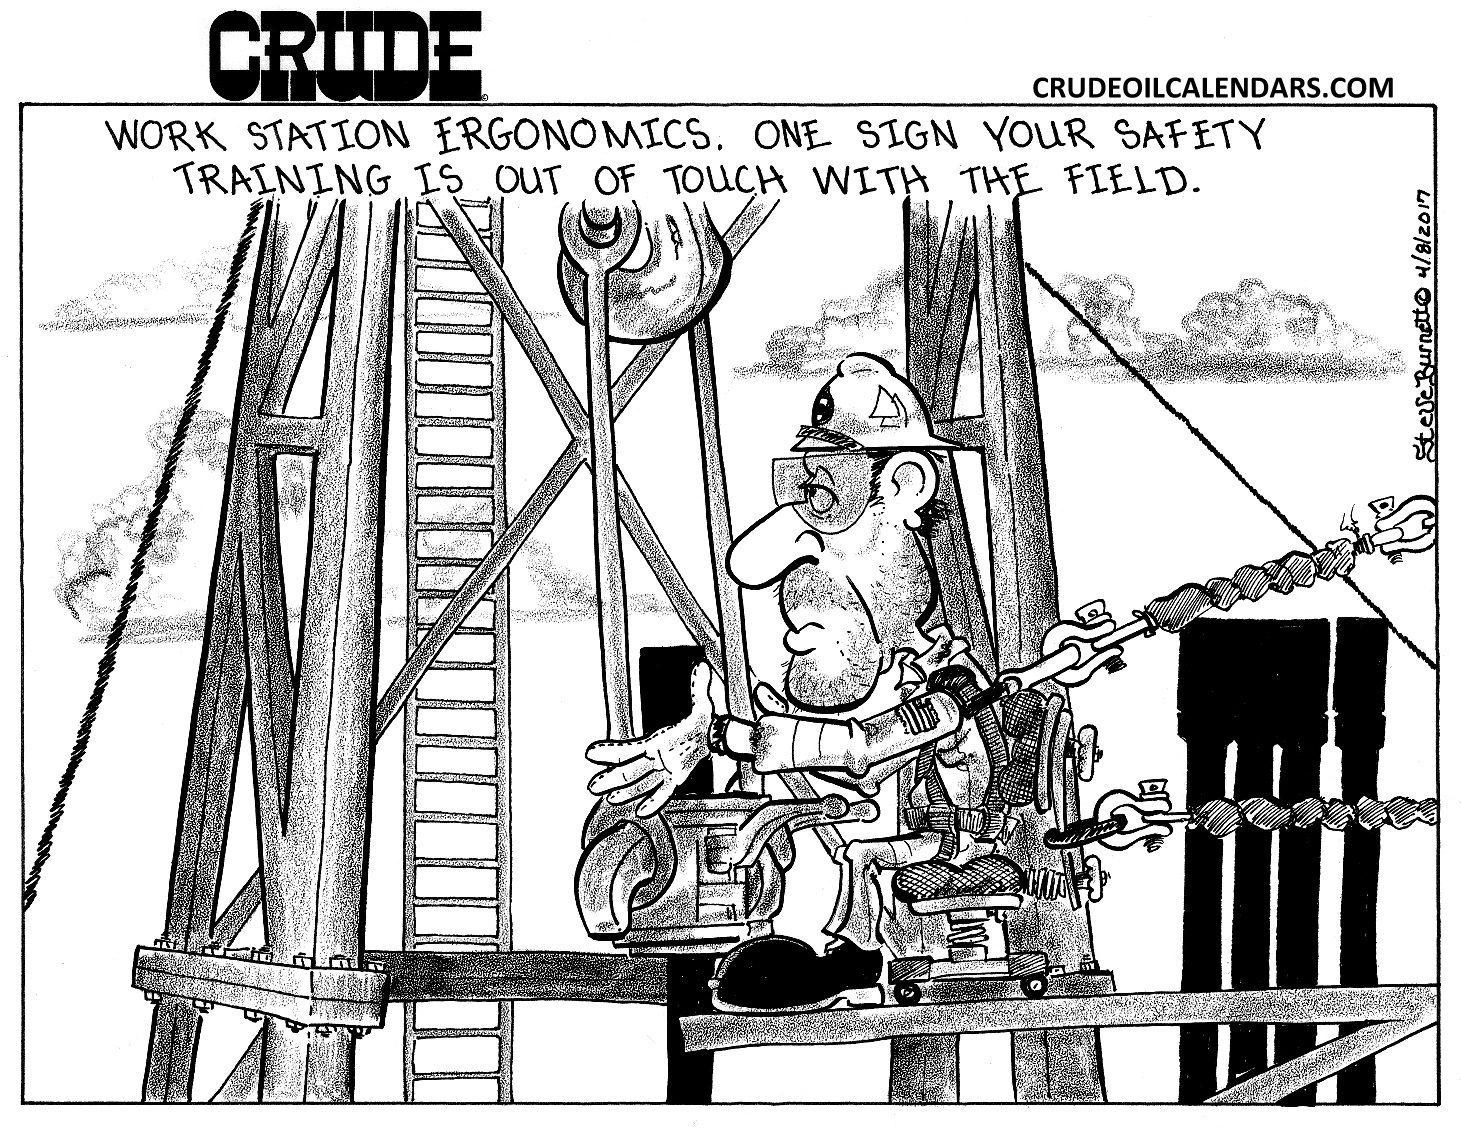 Crude Ergonomics